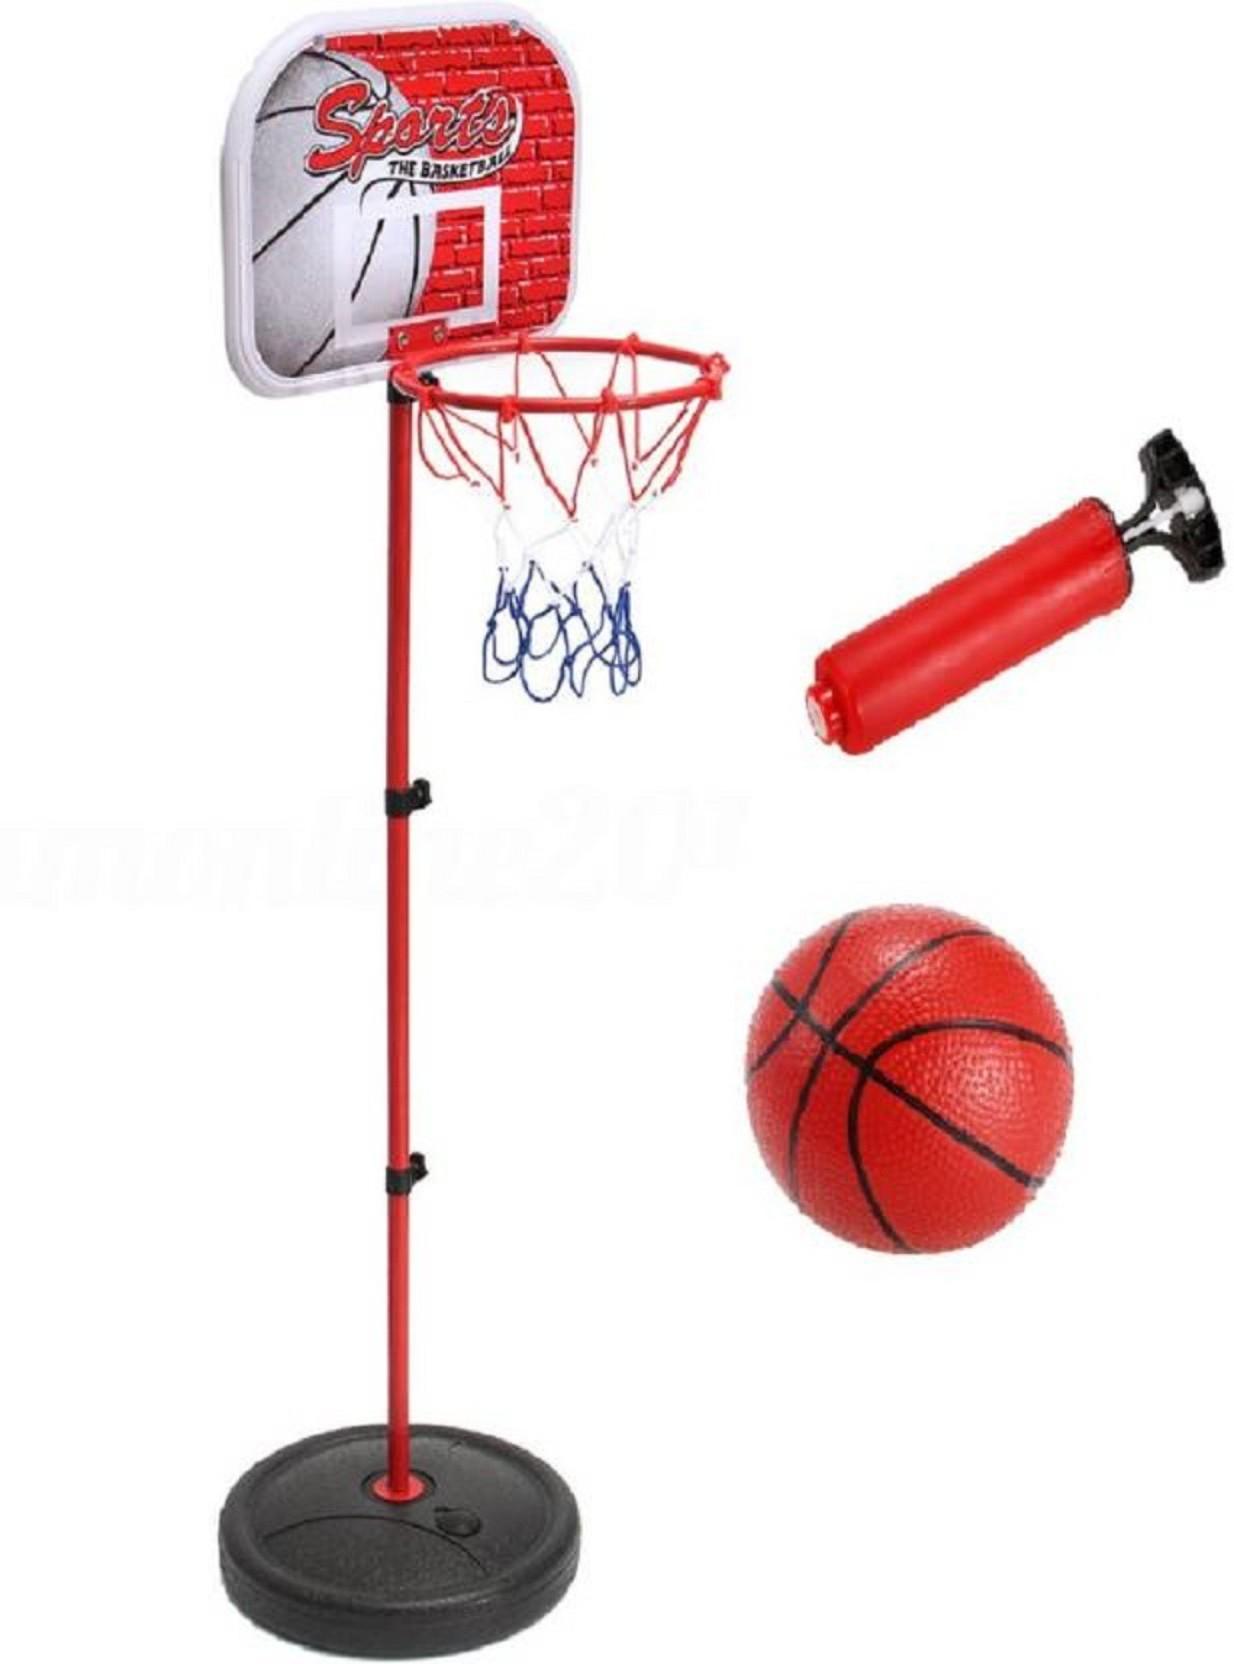 4cb4418b34f Vortex Toys Adjustable Height Kids Sports Portable Basketball Ball ...